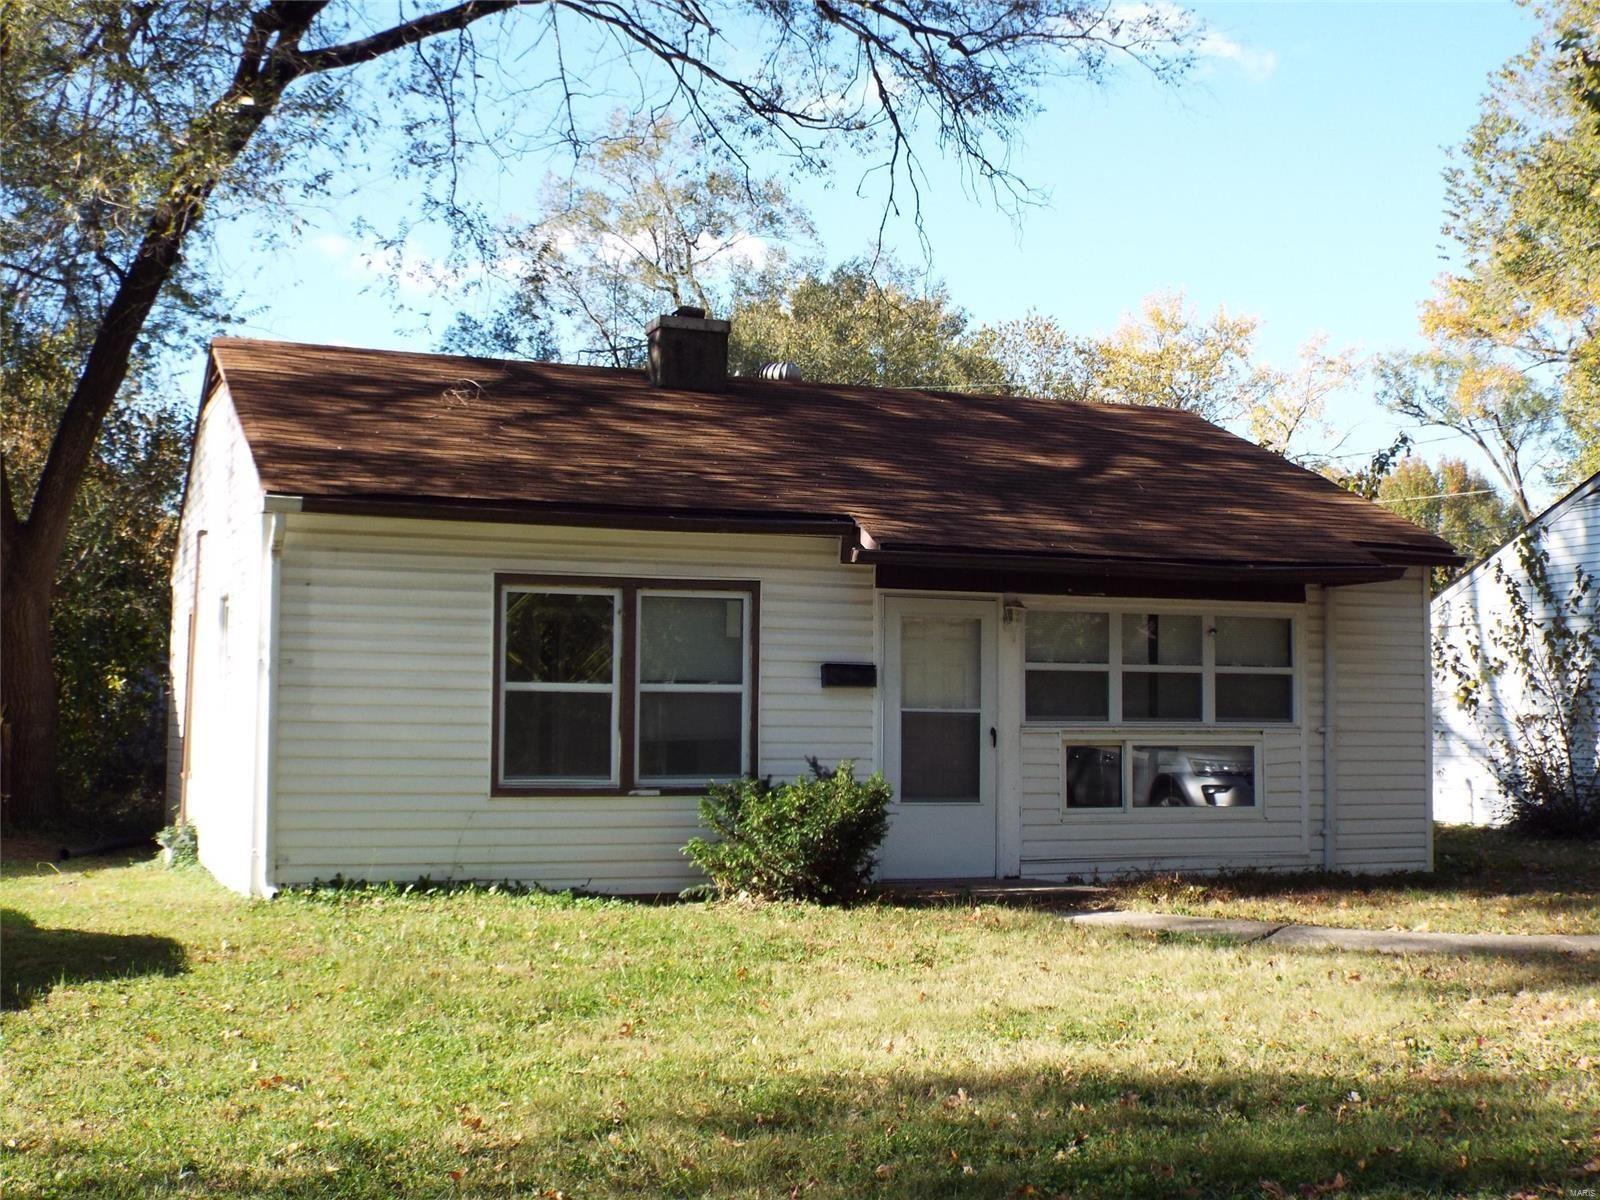 39 Helen Court, Cahokia, IL 62206 - MLS#: 19089224